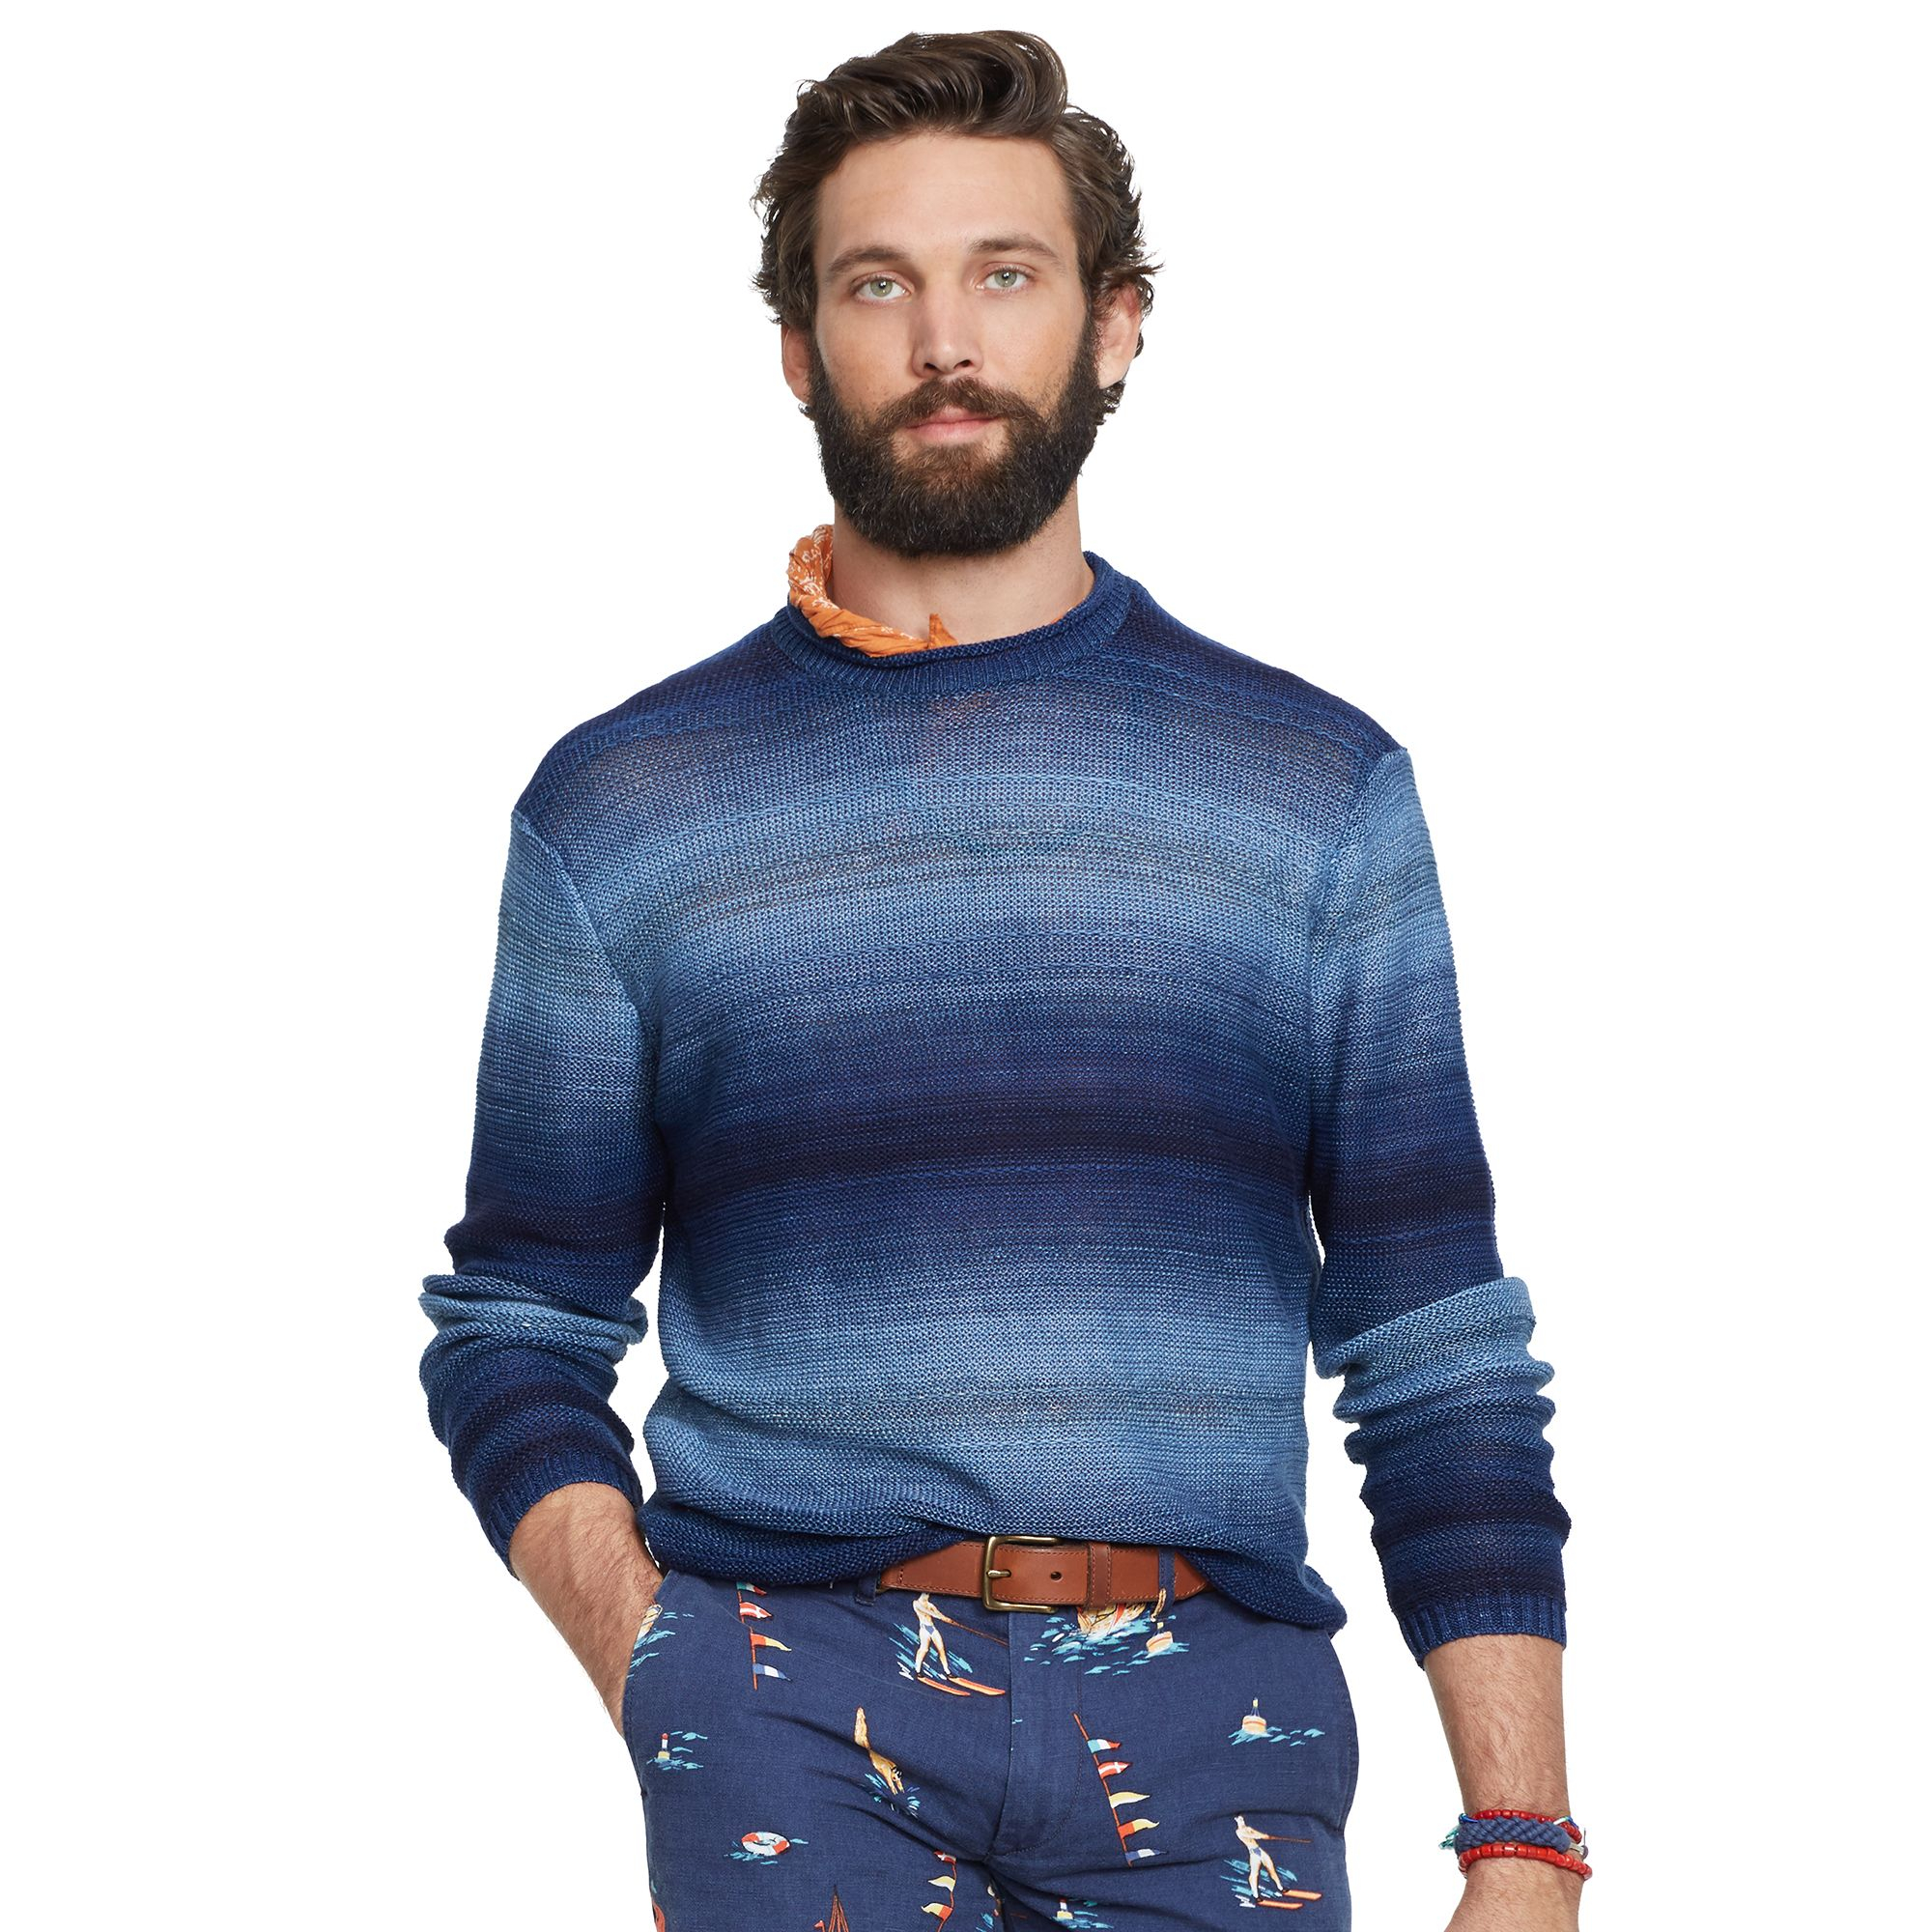 42eb4da7b Polo Ralph Lauren Ombré-Striped Sweater in Blue for Men - Lyst